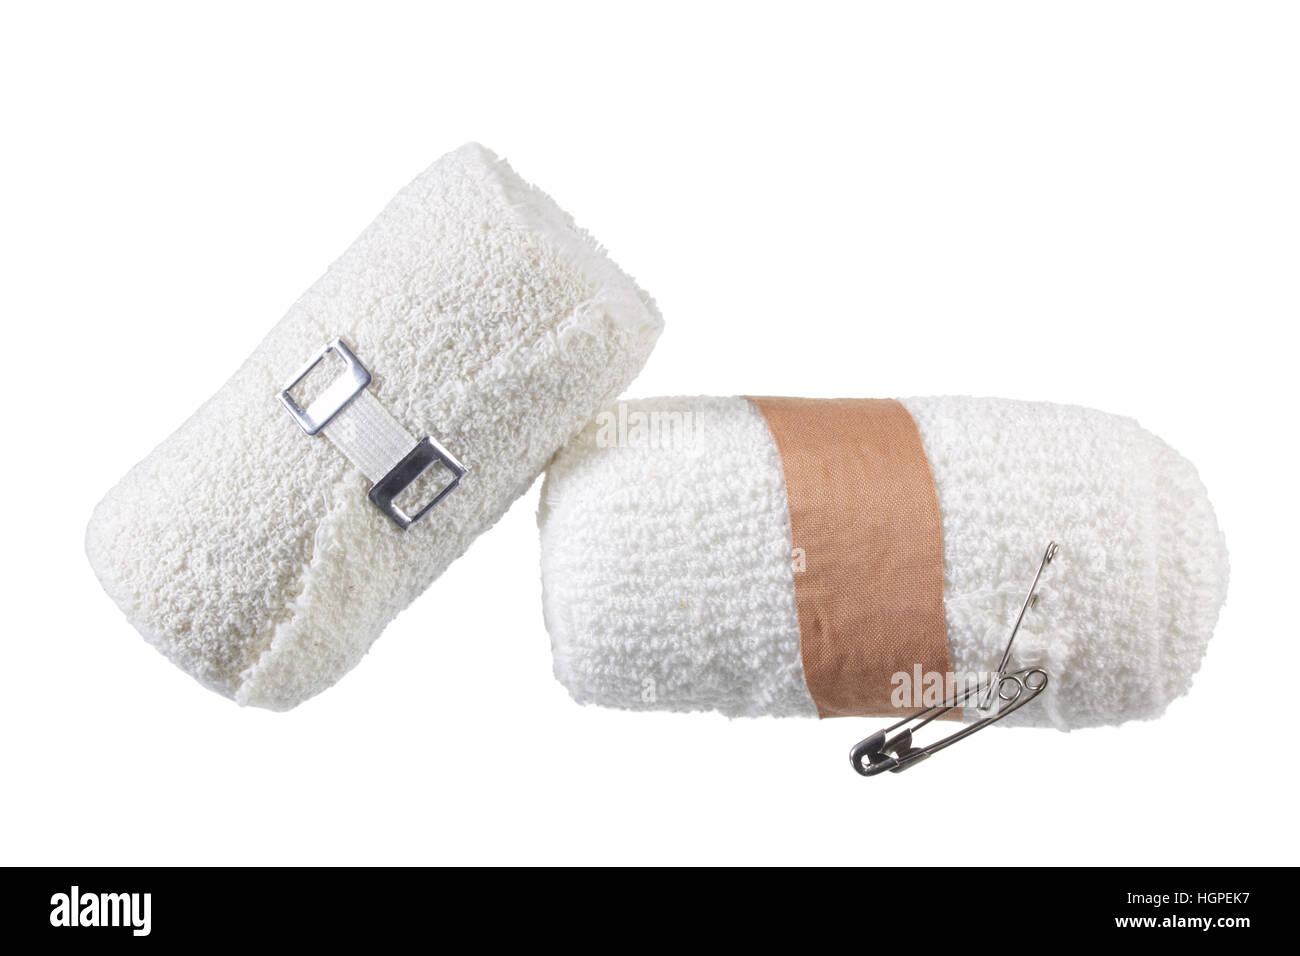 Rolls of Bandages - Stock Image